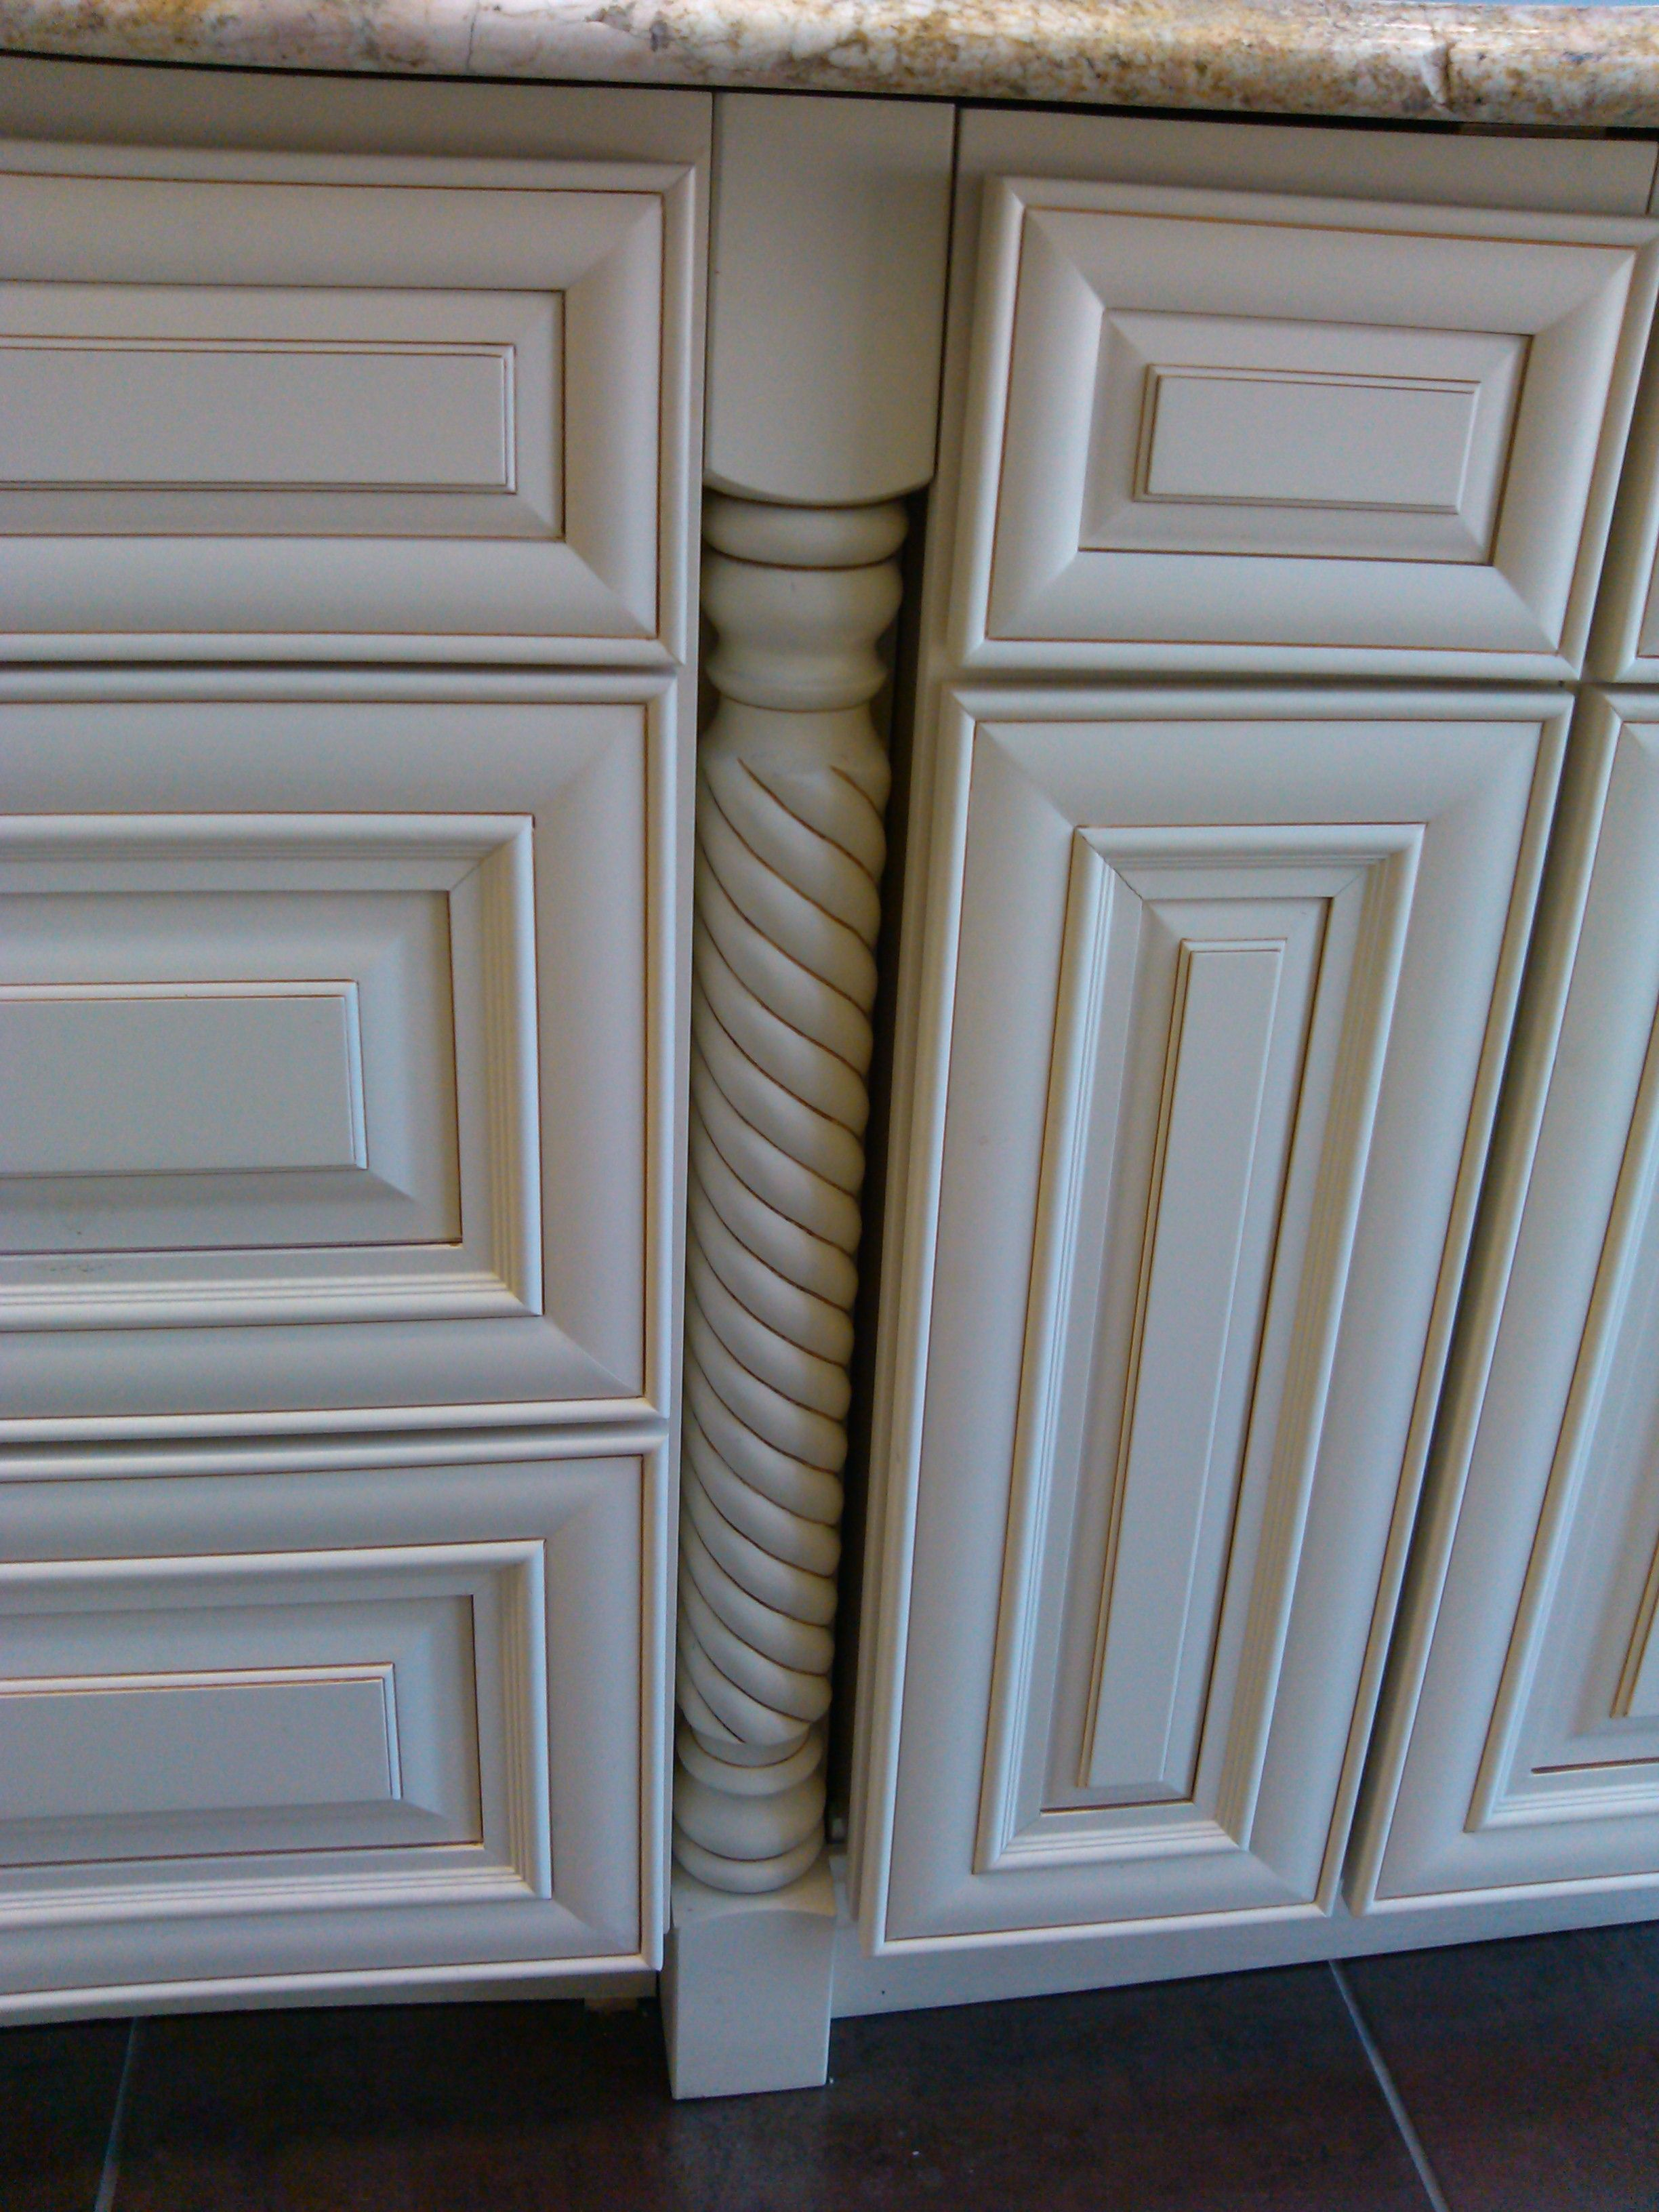 Cream Maple Glaze Rta Cabinets From Cabinetsdirectrta Com Rta Cabinets Rta Kitchen Cabinets Rta Kitchen